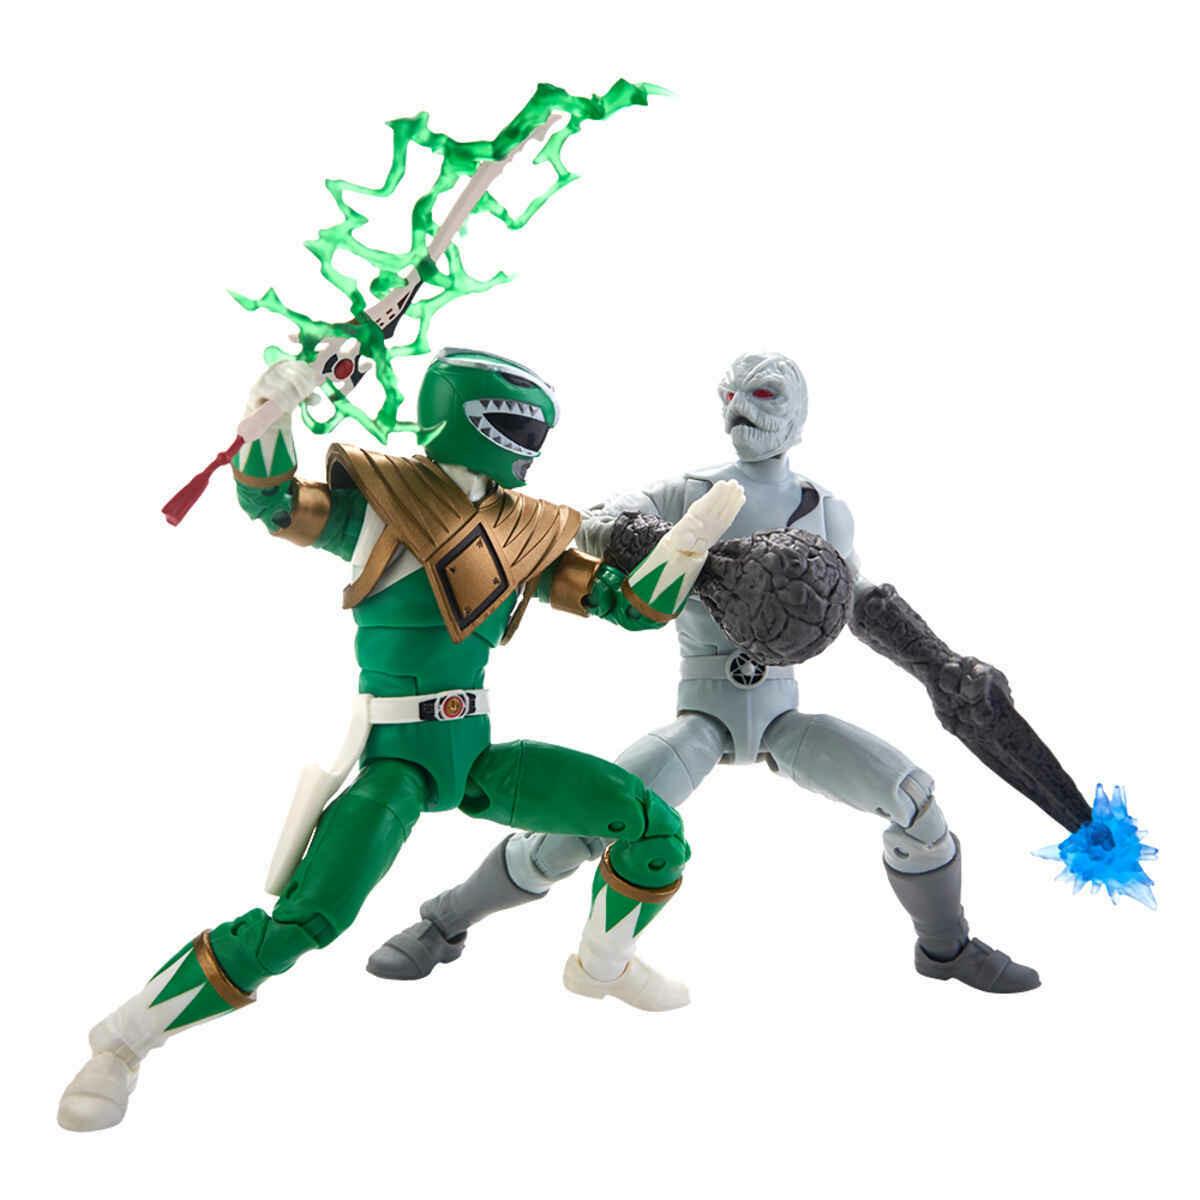 Hasbro - Power Rangers Lightning Green Vs Putty 6'